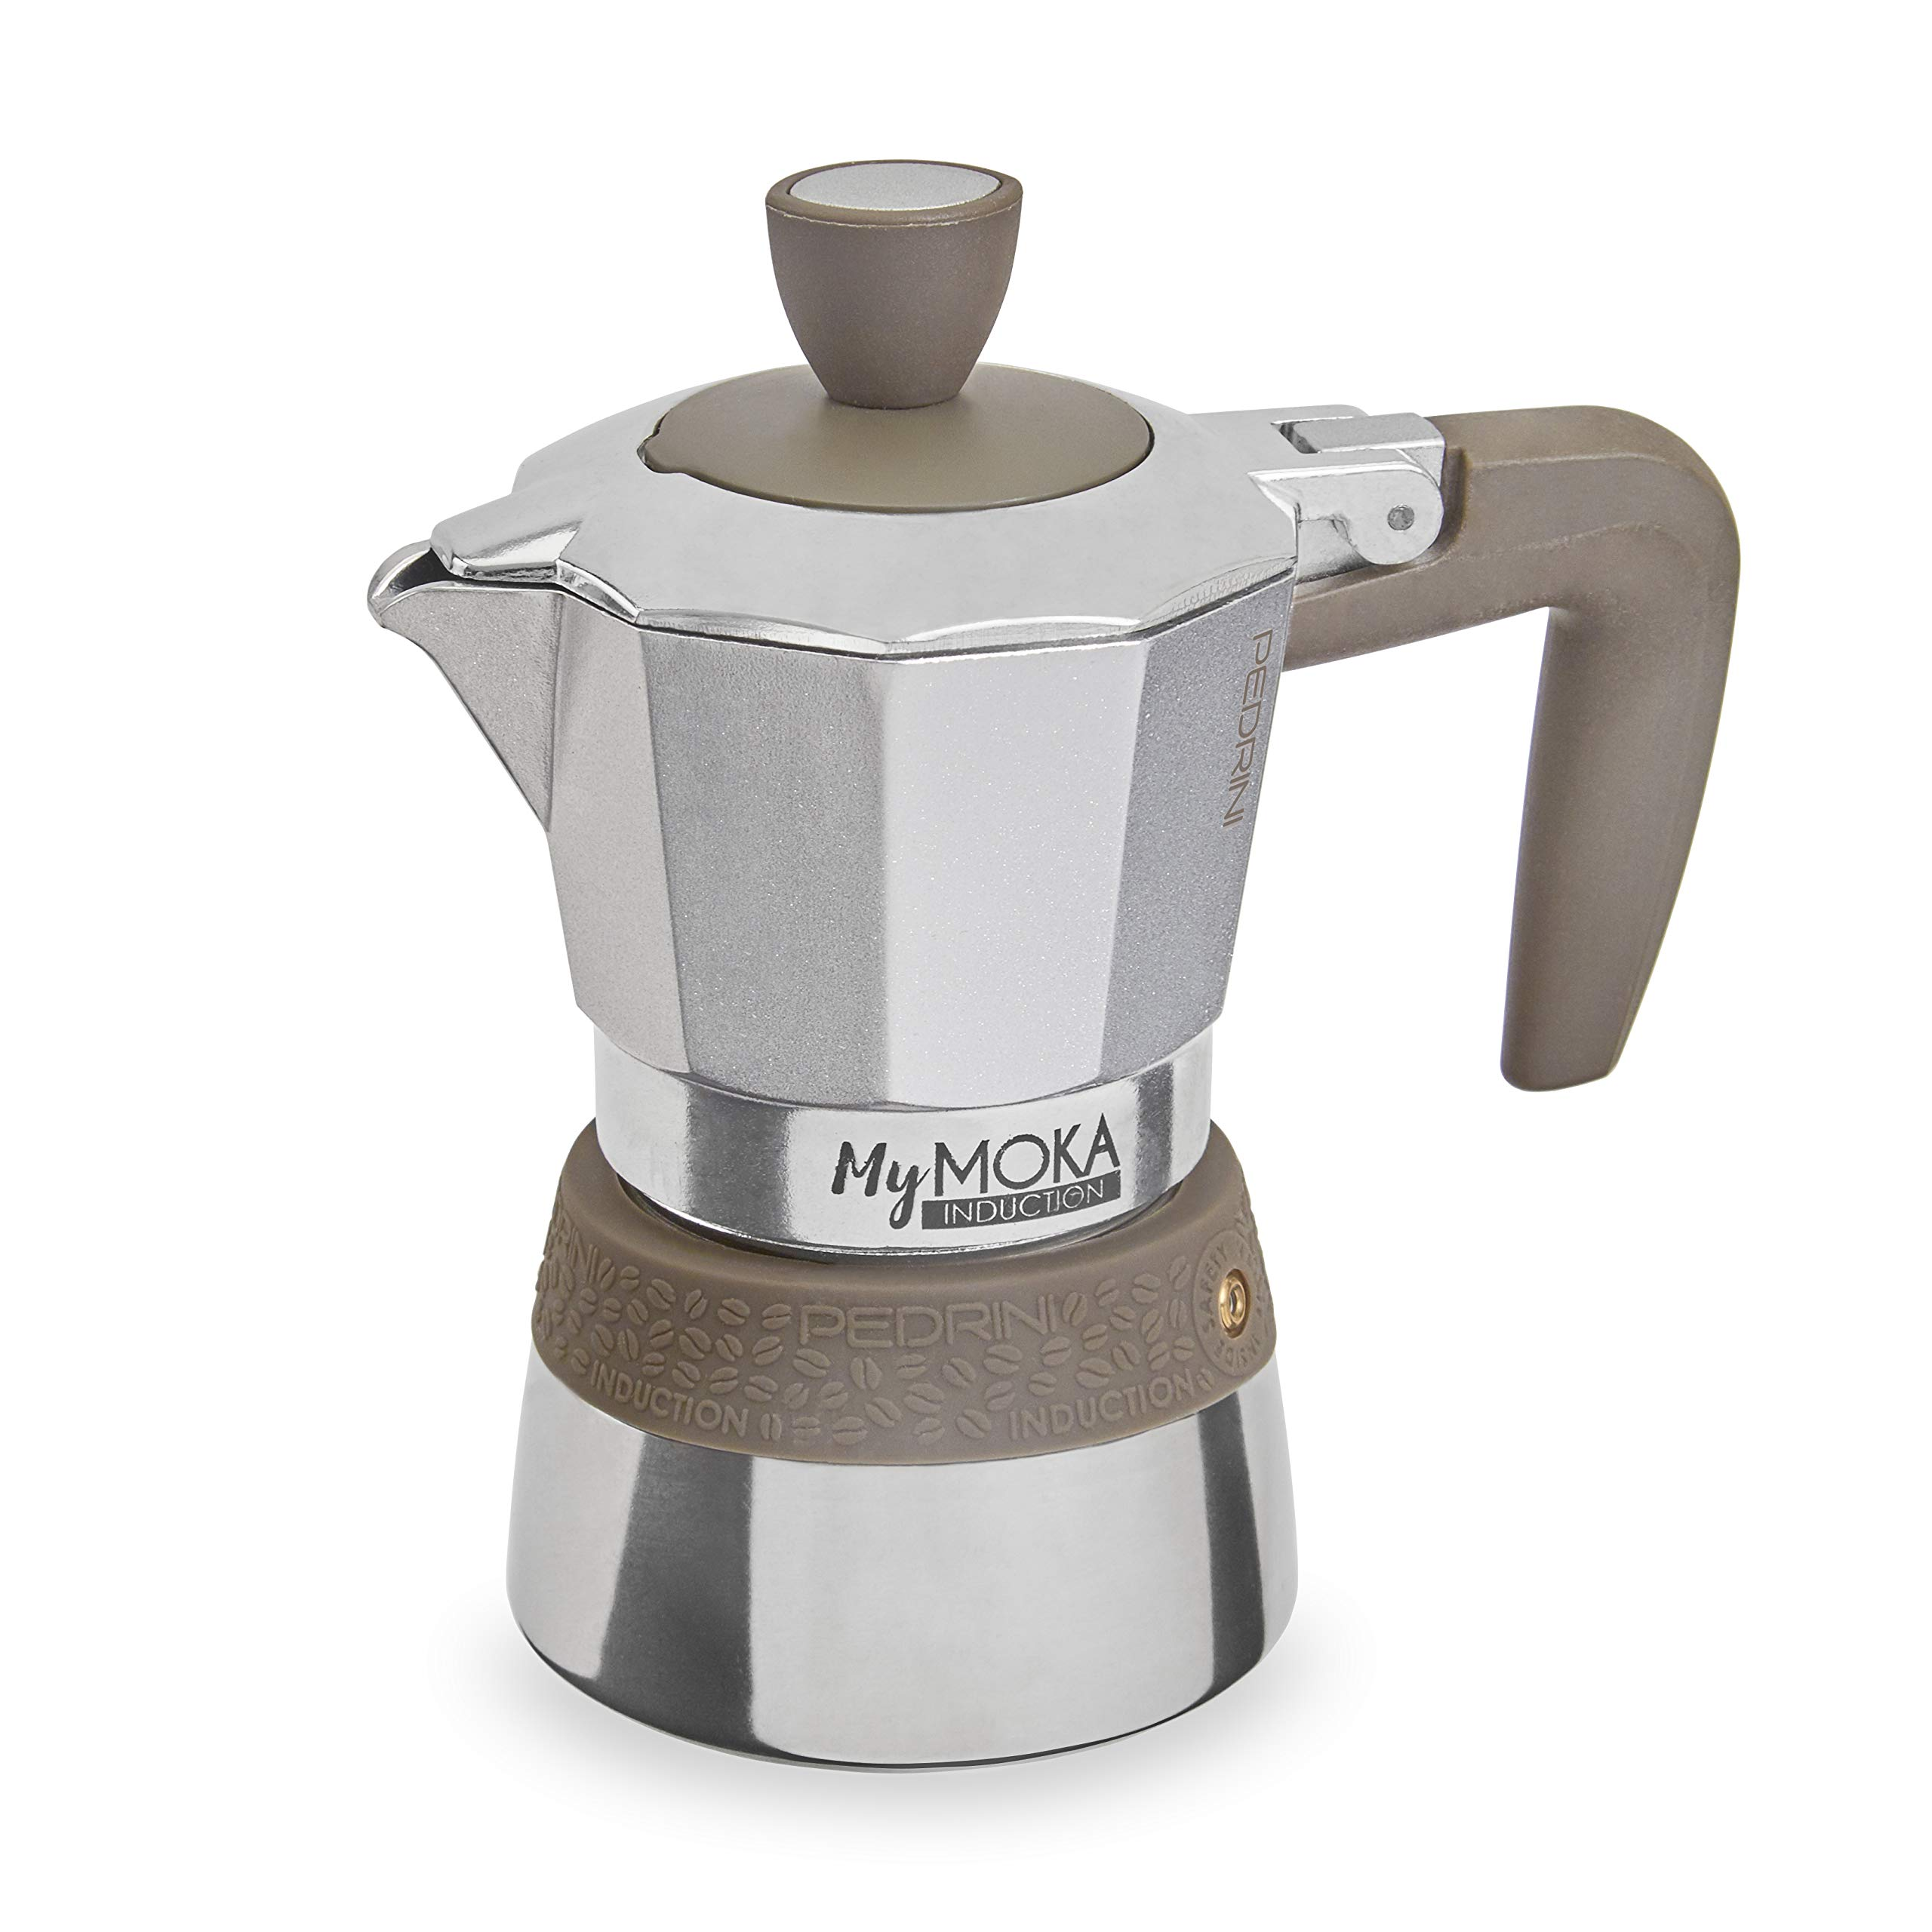 Pedrini MyMoka - Cafetera de inducción Inducción Mymoka 2 Tazze ...